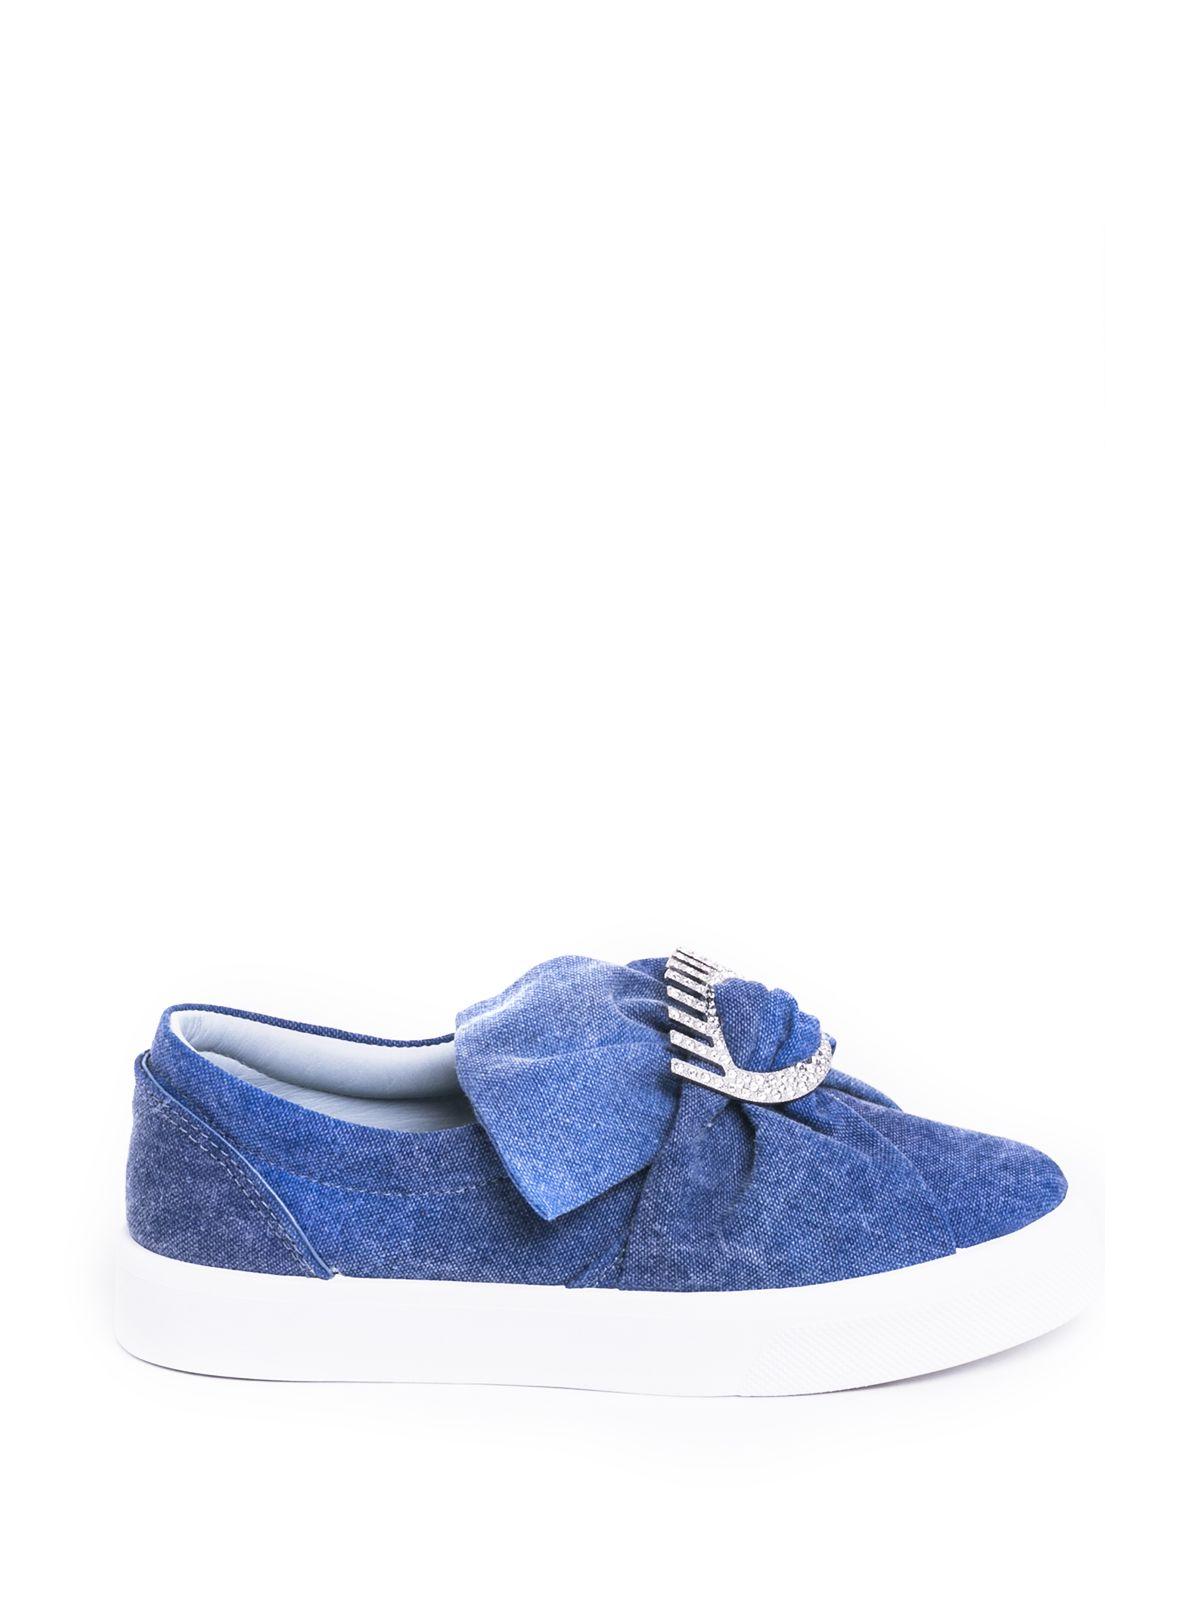 Chiara Ferragni Oversized Bow Slip-on Sneakers